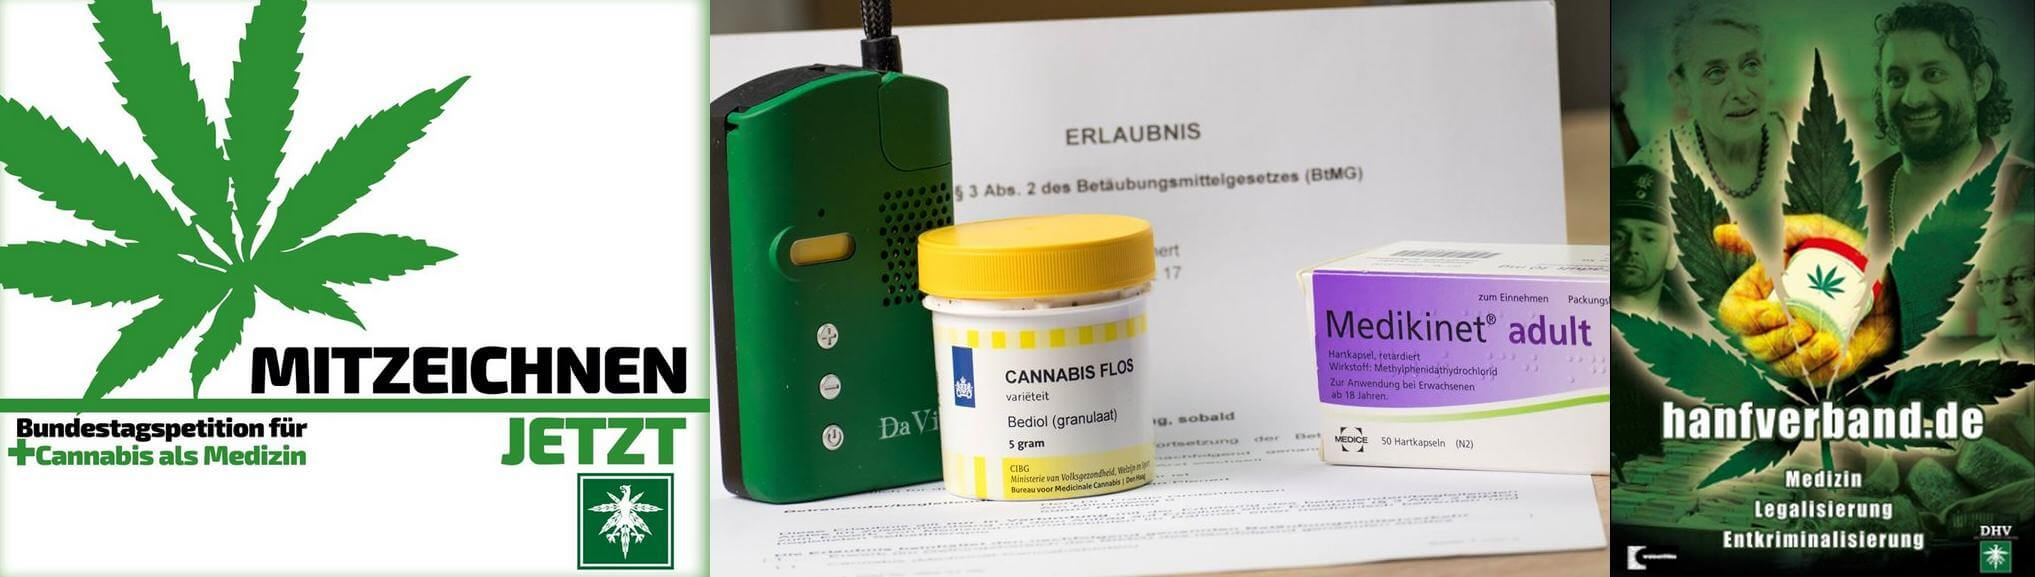 Actualités du cannabis médical, Mars 2015